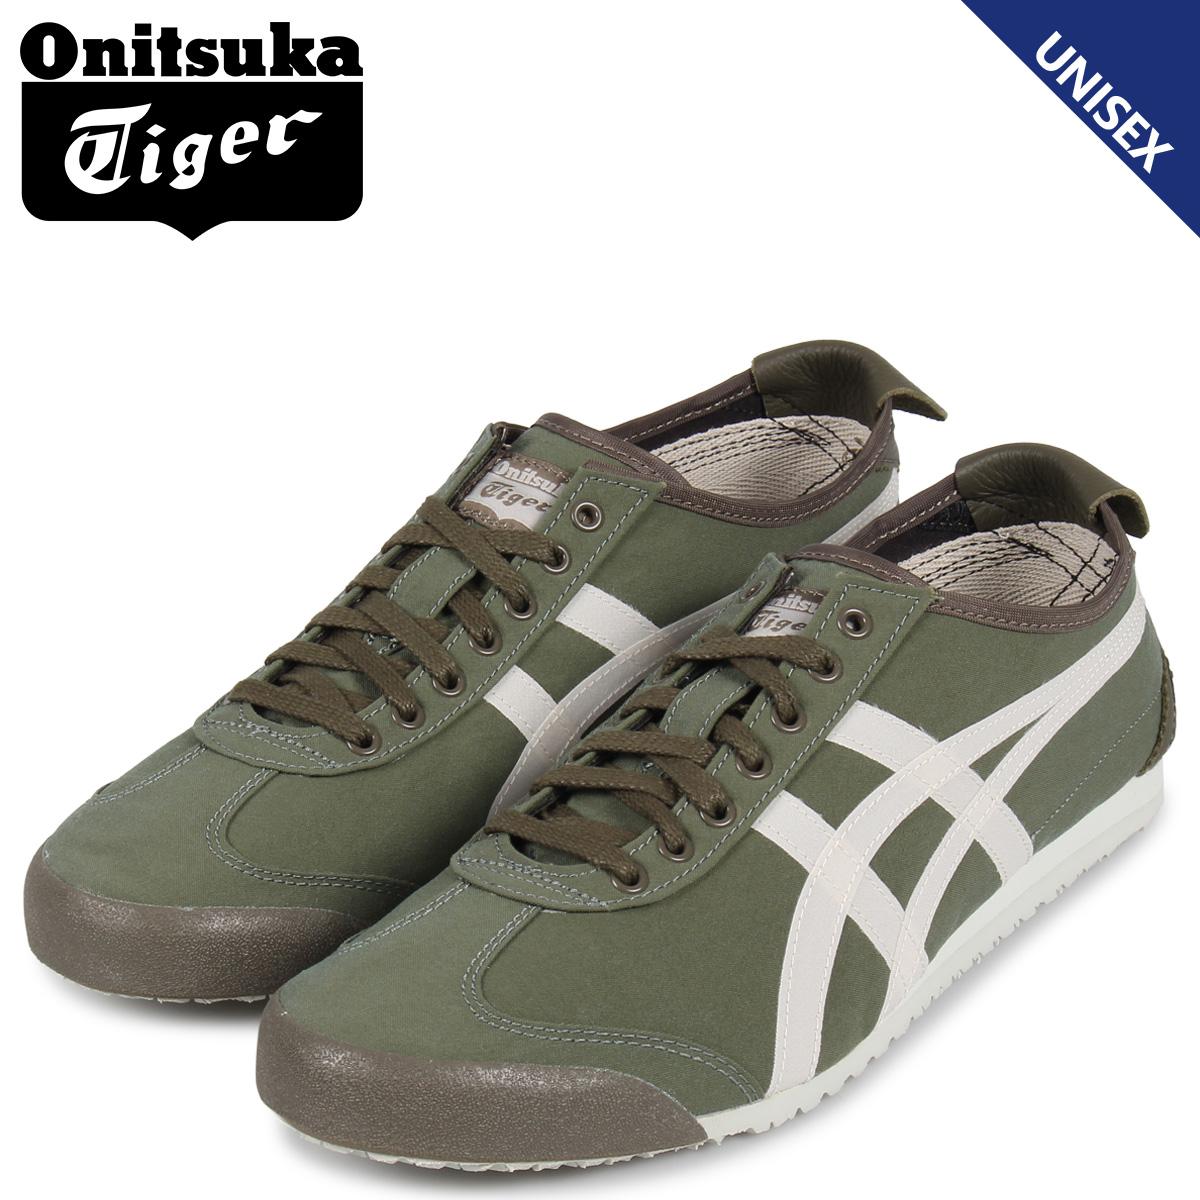 newest 7f55b 8d266 Onitsuka Tiger Onitsuka tiger Mexico 66 sneakers men gap Dis MEXICO 66  olive 1183A348-300